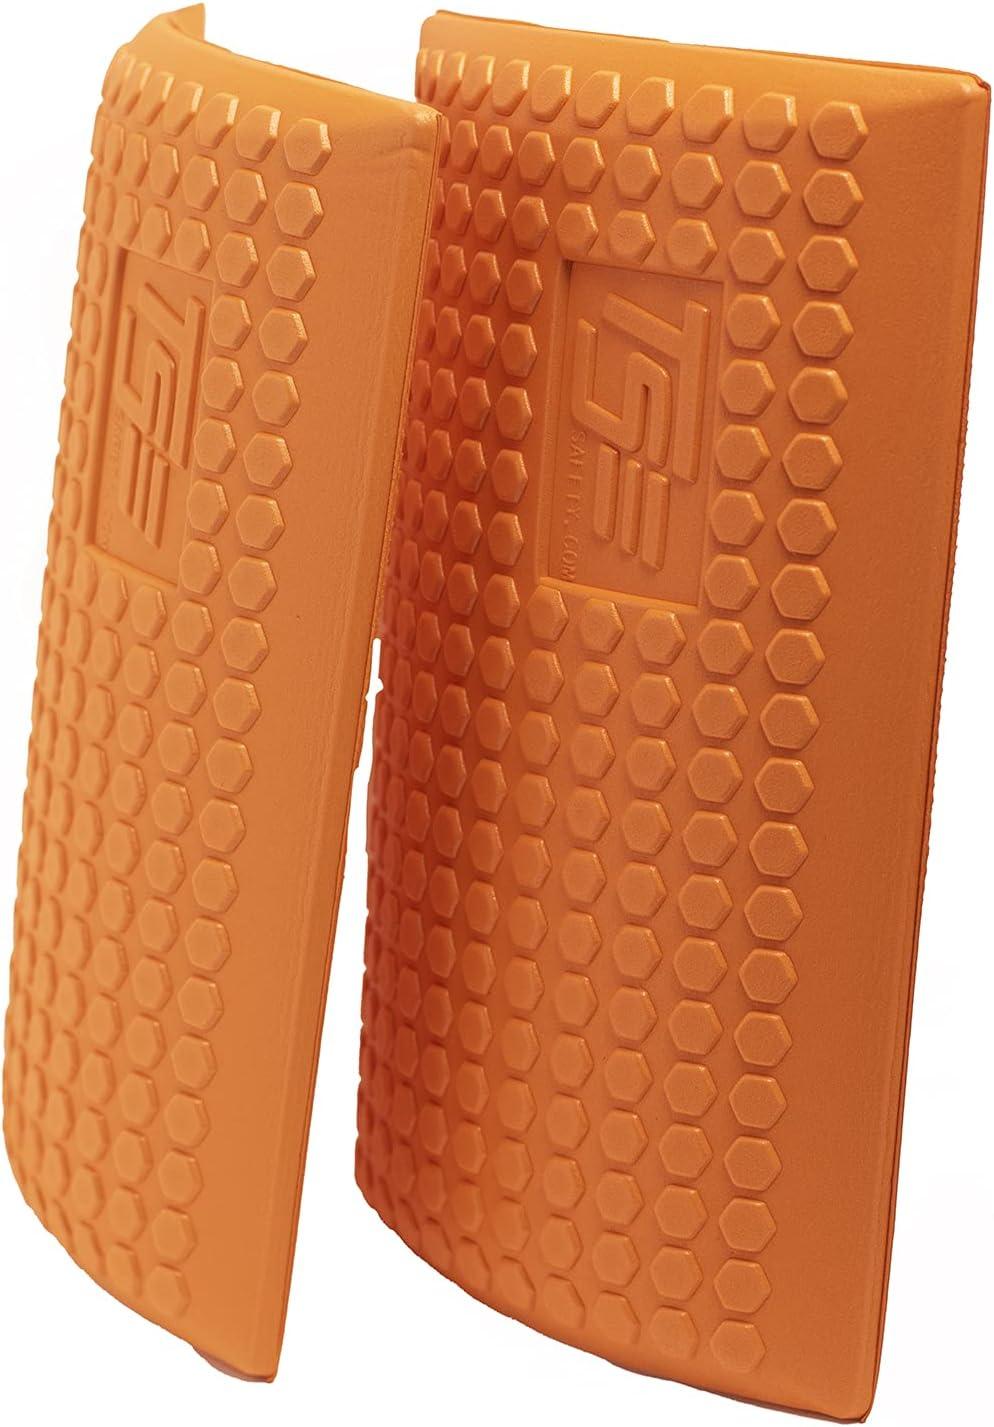 TSE Safety TSE-PPKS TSE-PRO Heavy Duty Padding Pocket Knee Savers with Extra Thick Foam Cushion, Soft Inner Liner, Adjustable One Size, Hi-Viz Orange